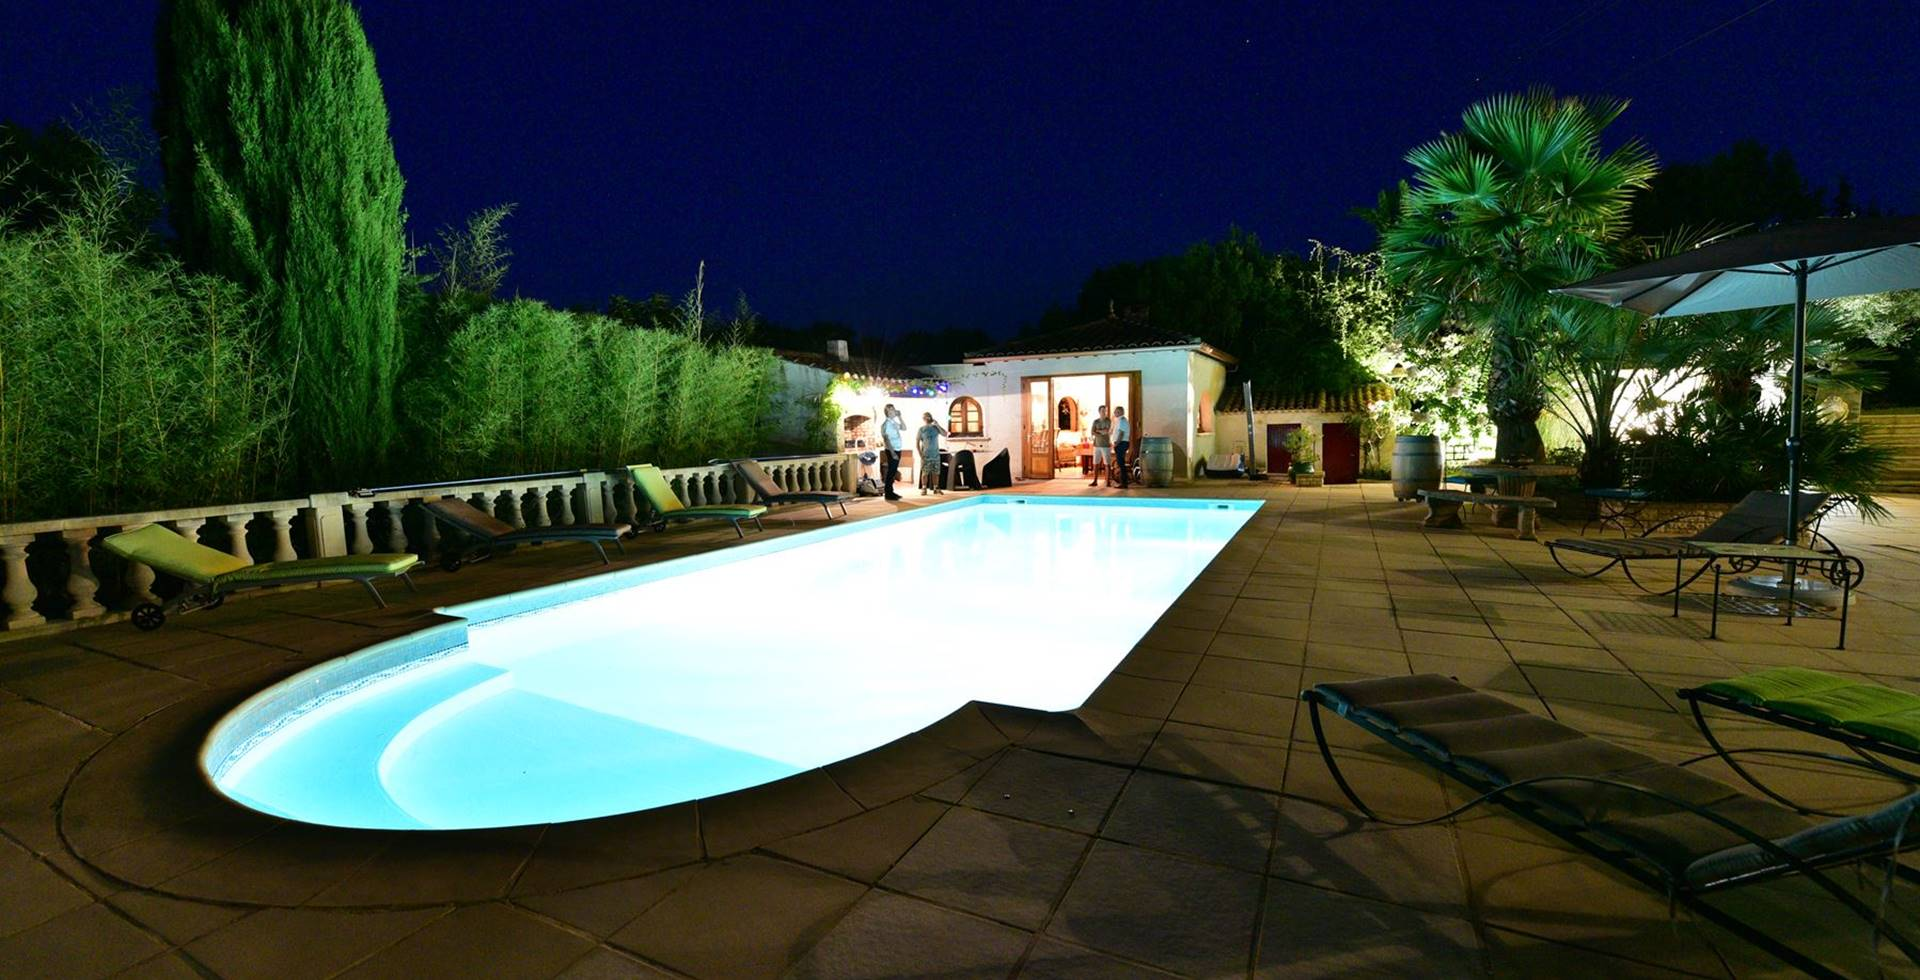 casadina-gites-villas-studio-piscine-de-nuit-sommieres